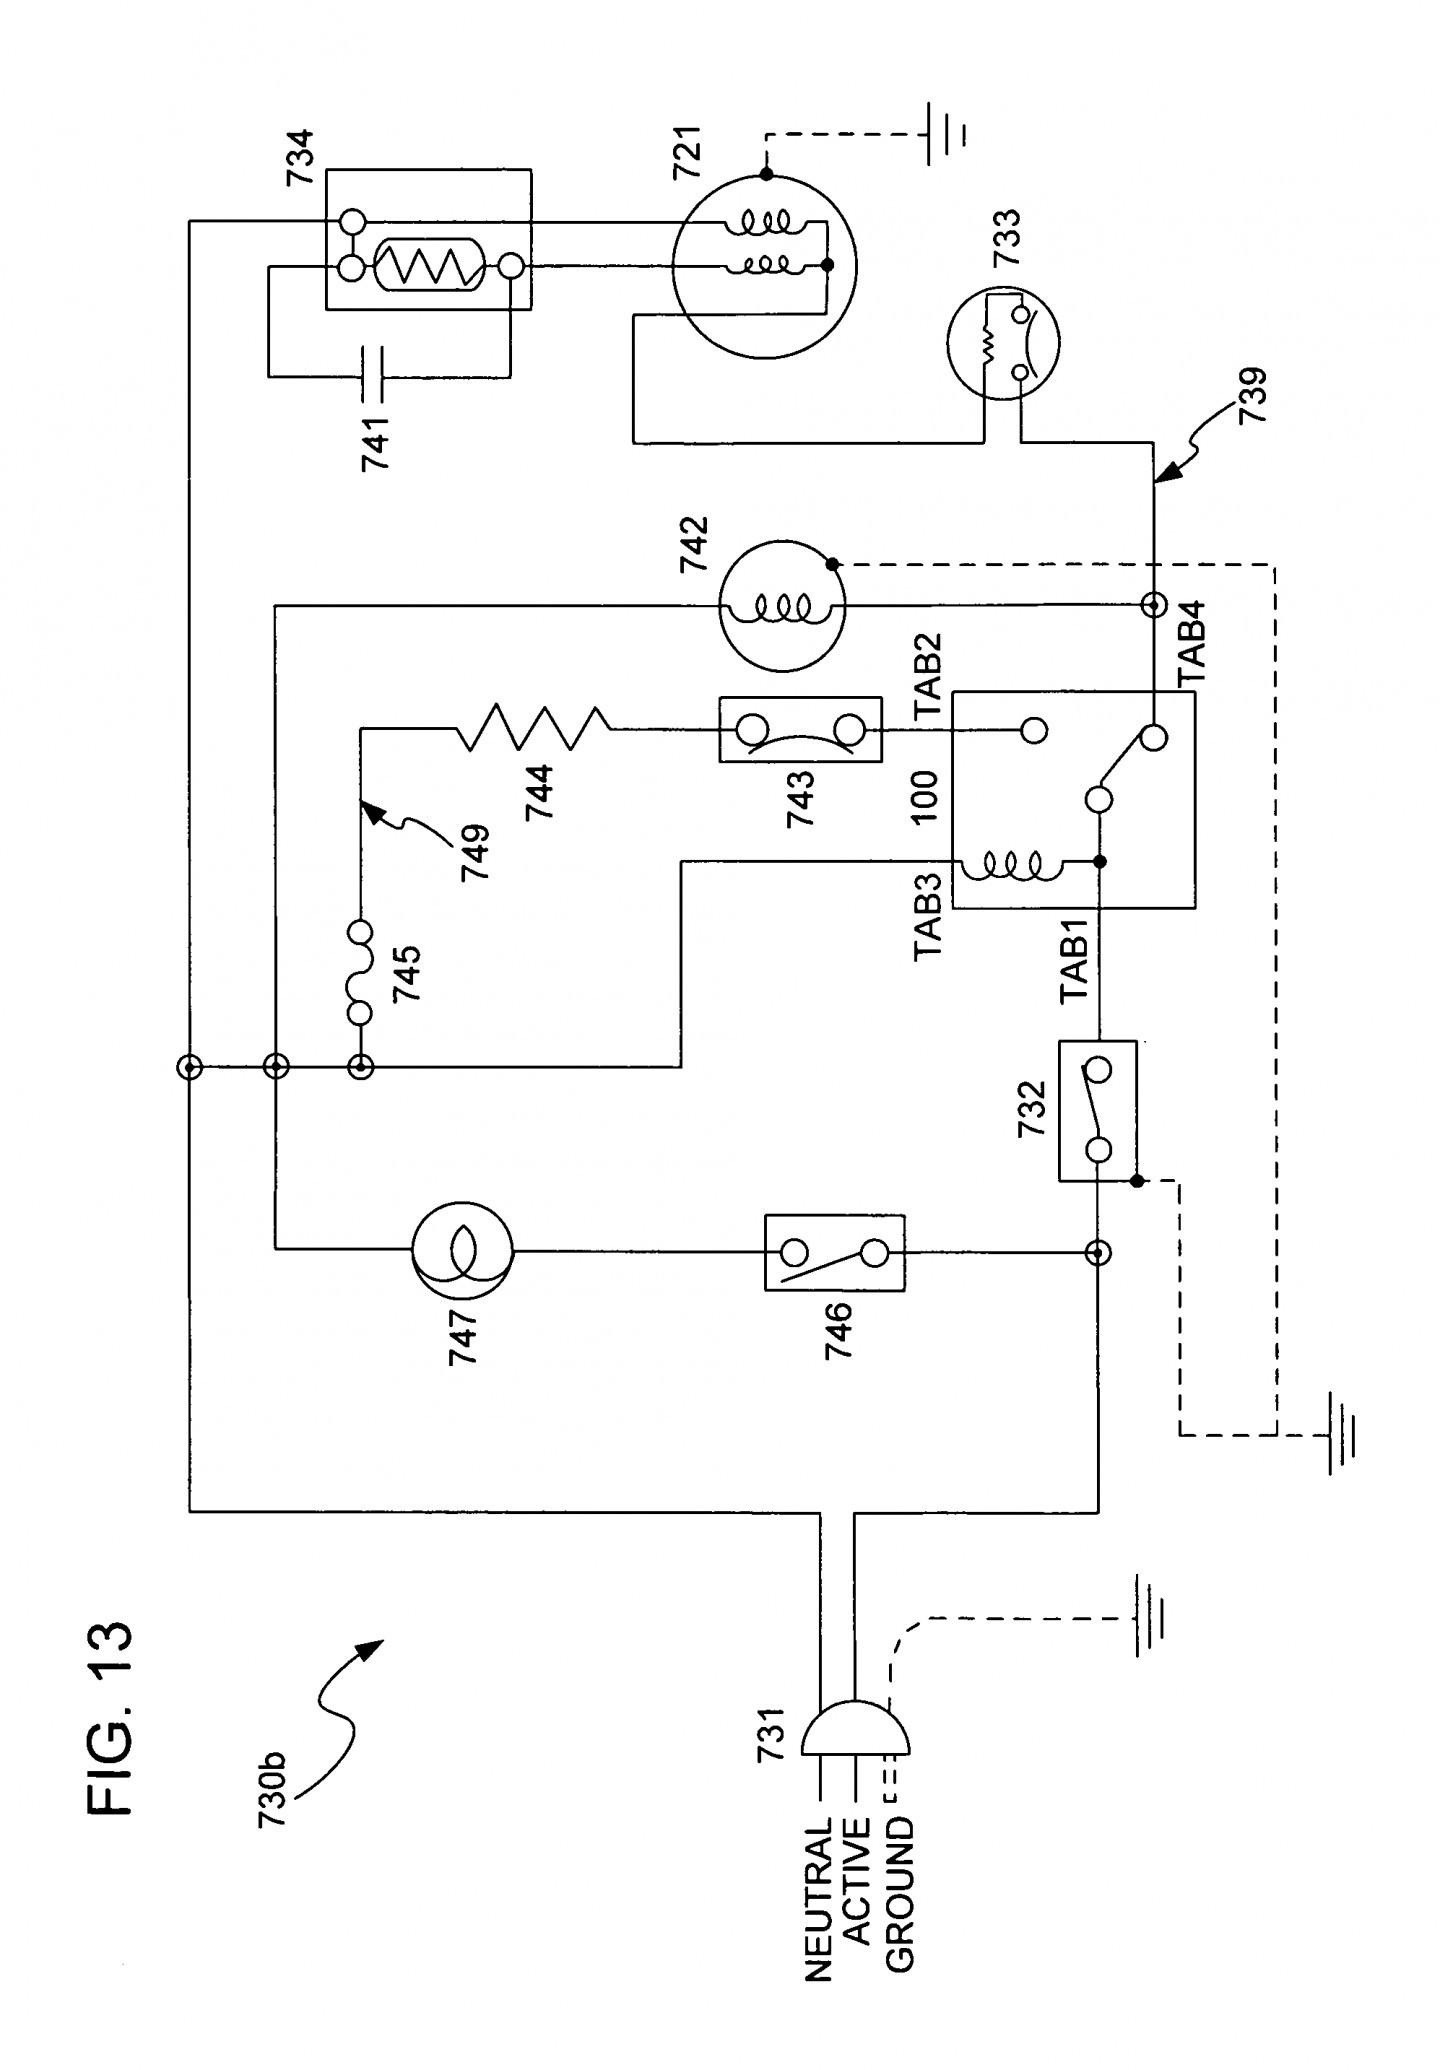 Swamp Cooler Wiring Diagram Inspirational Famous True Freezer Wiring Diagram Inspiration